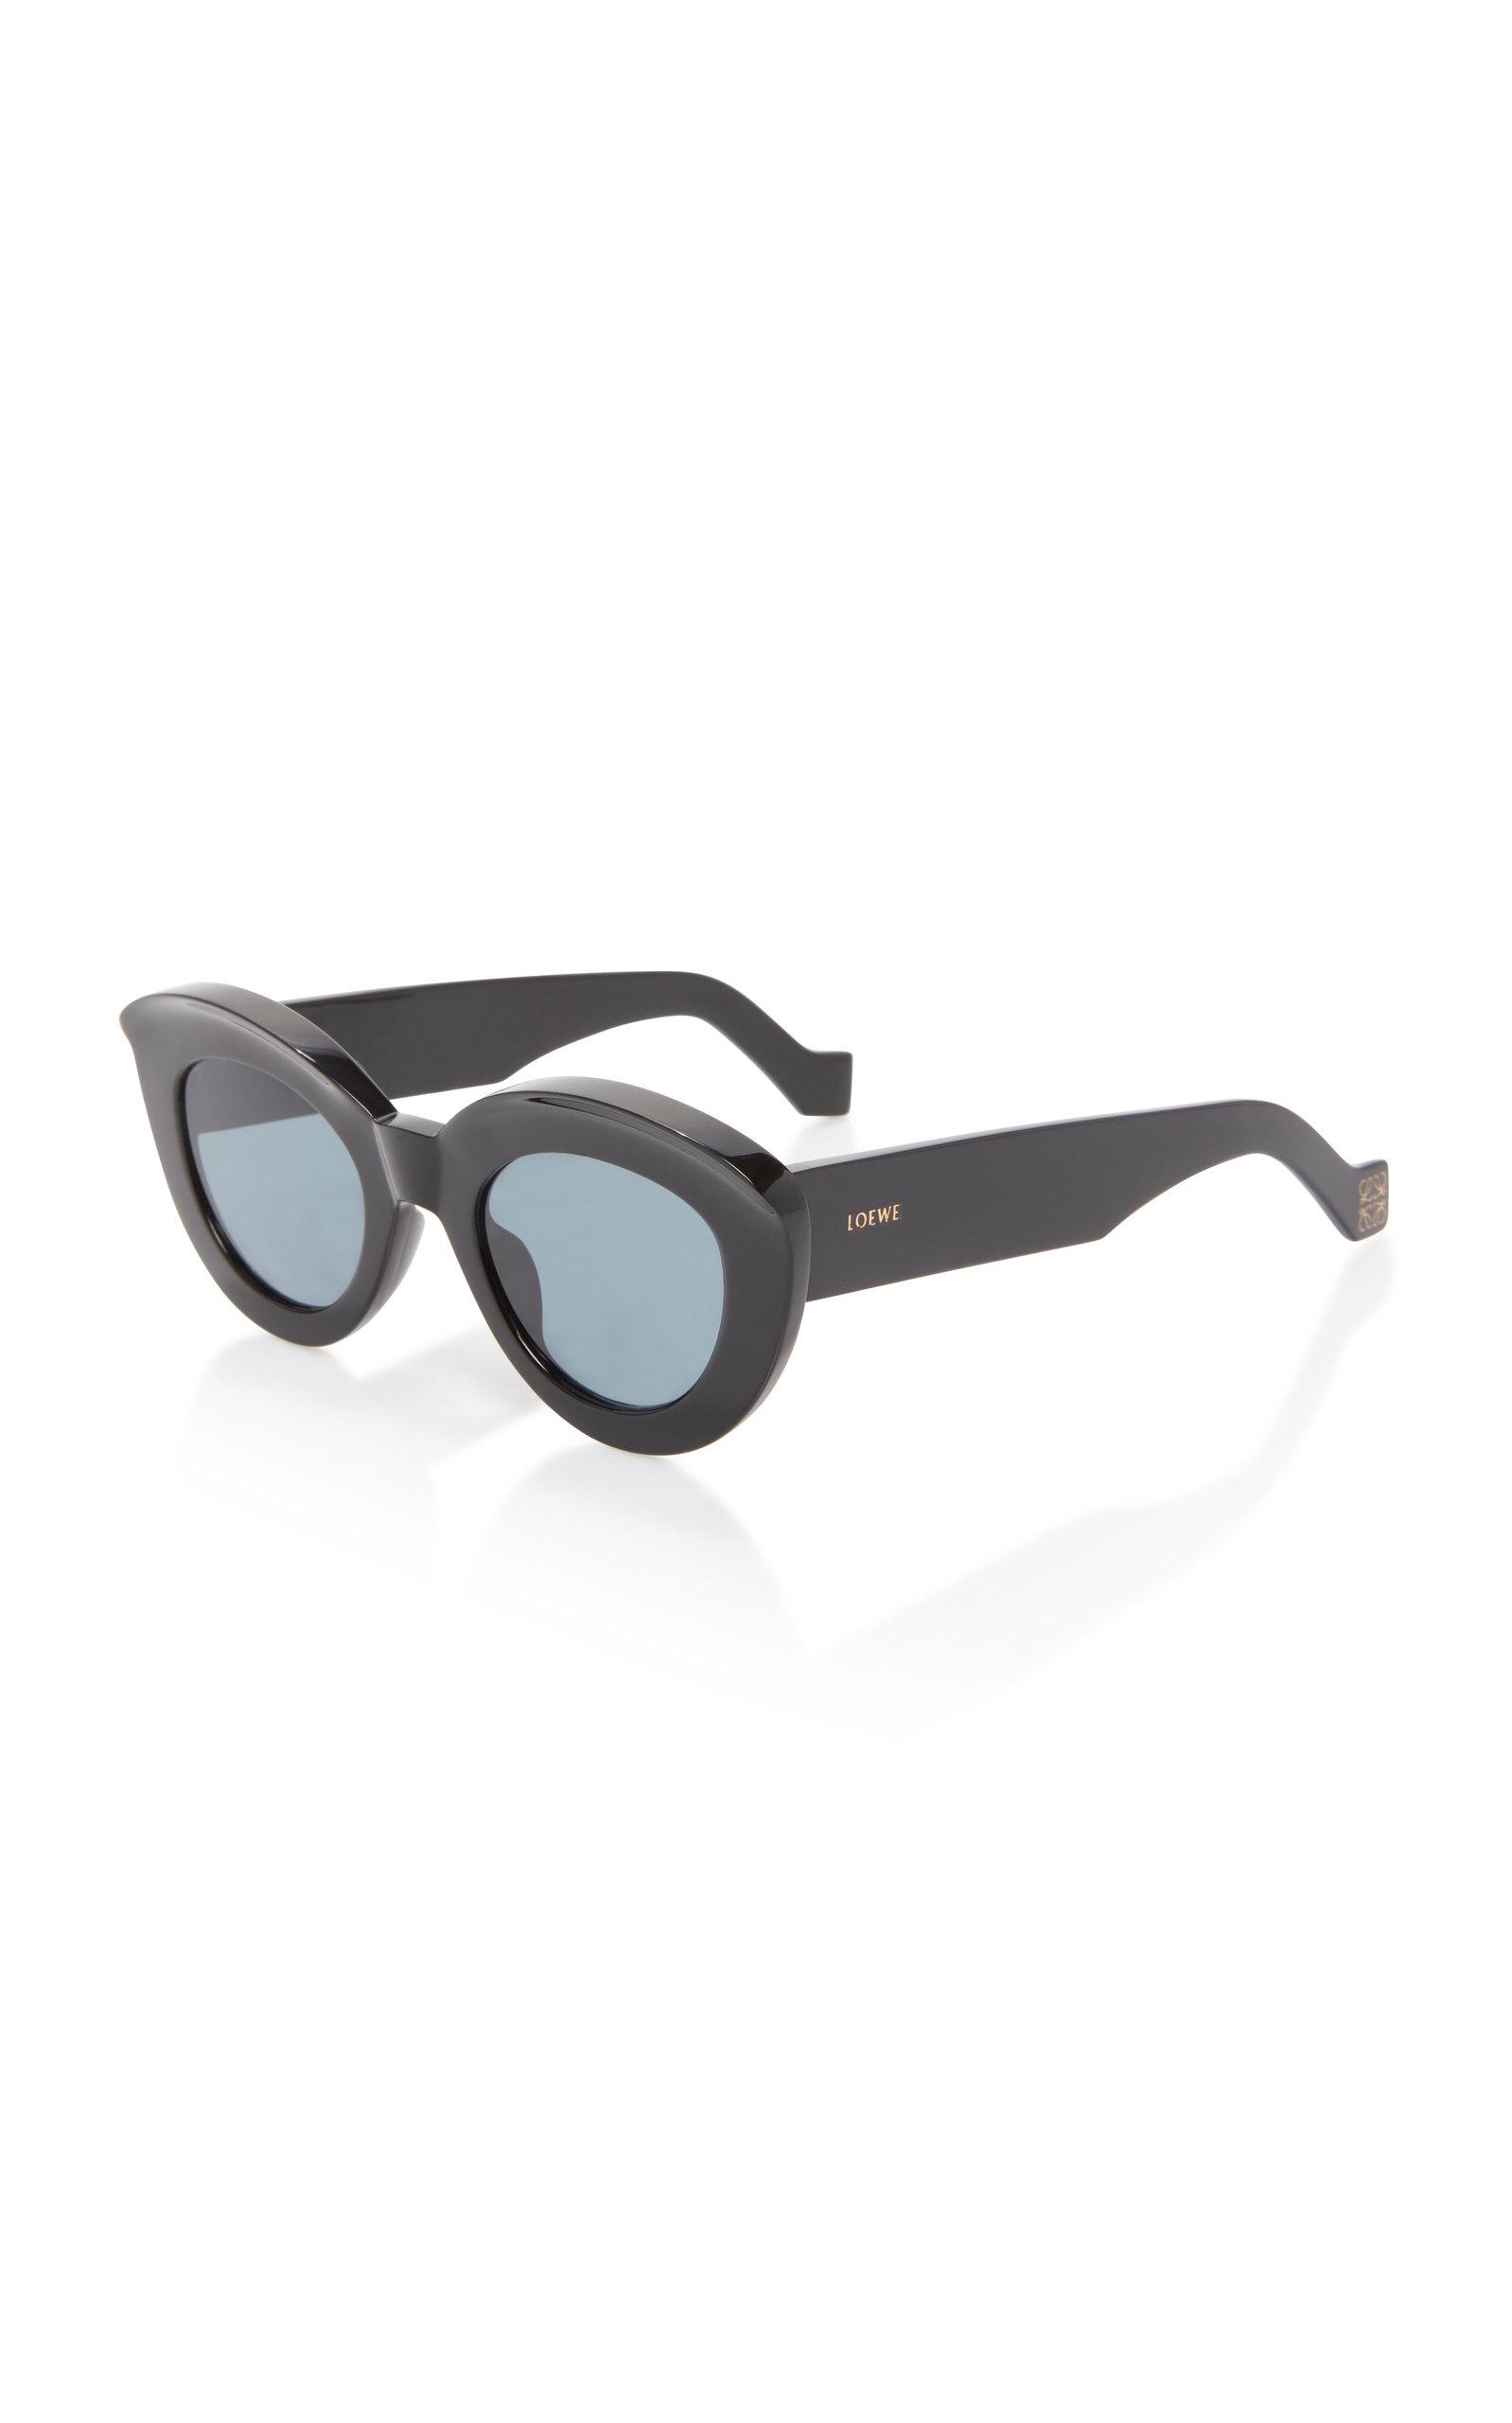 356bcef288 Loewe SunglassesCat-Eye Acetate Sunglasses. CLOSE. Loading